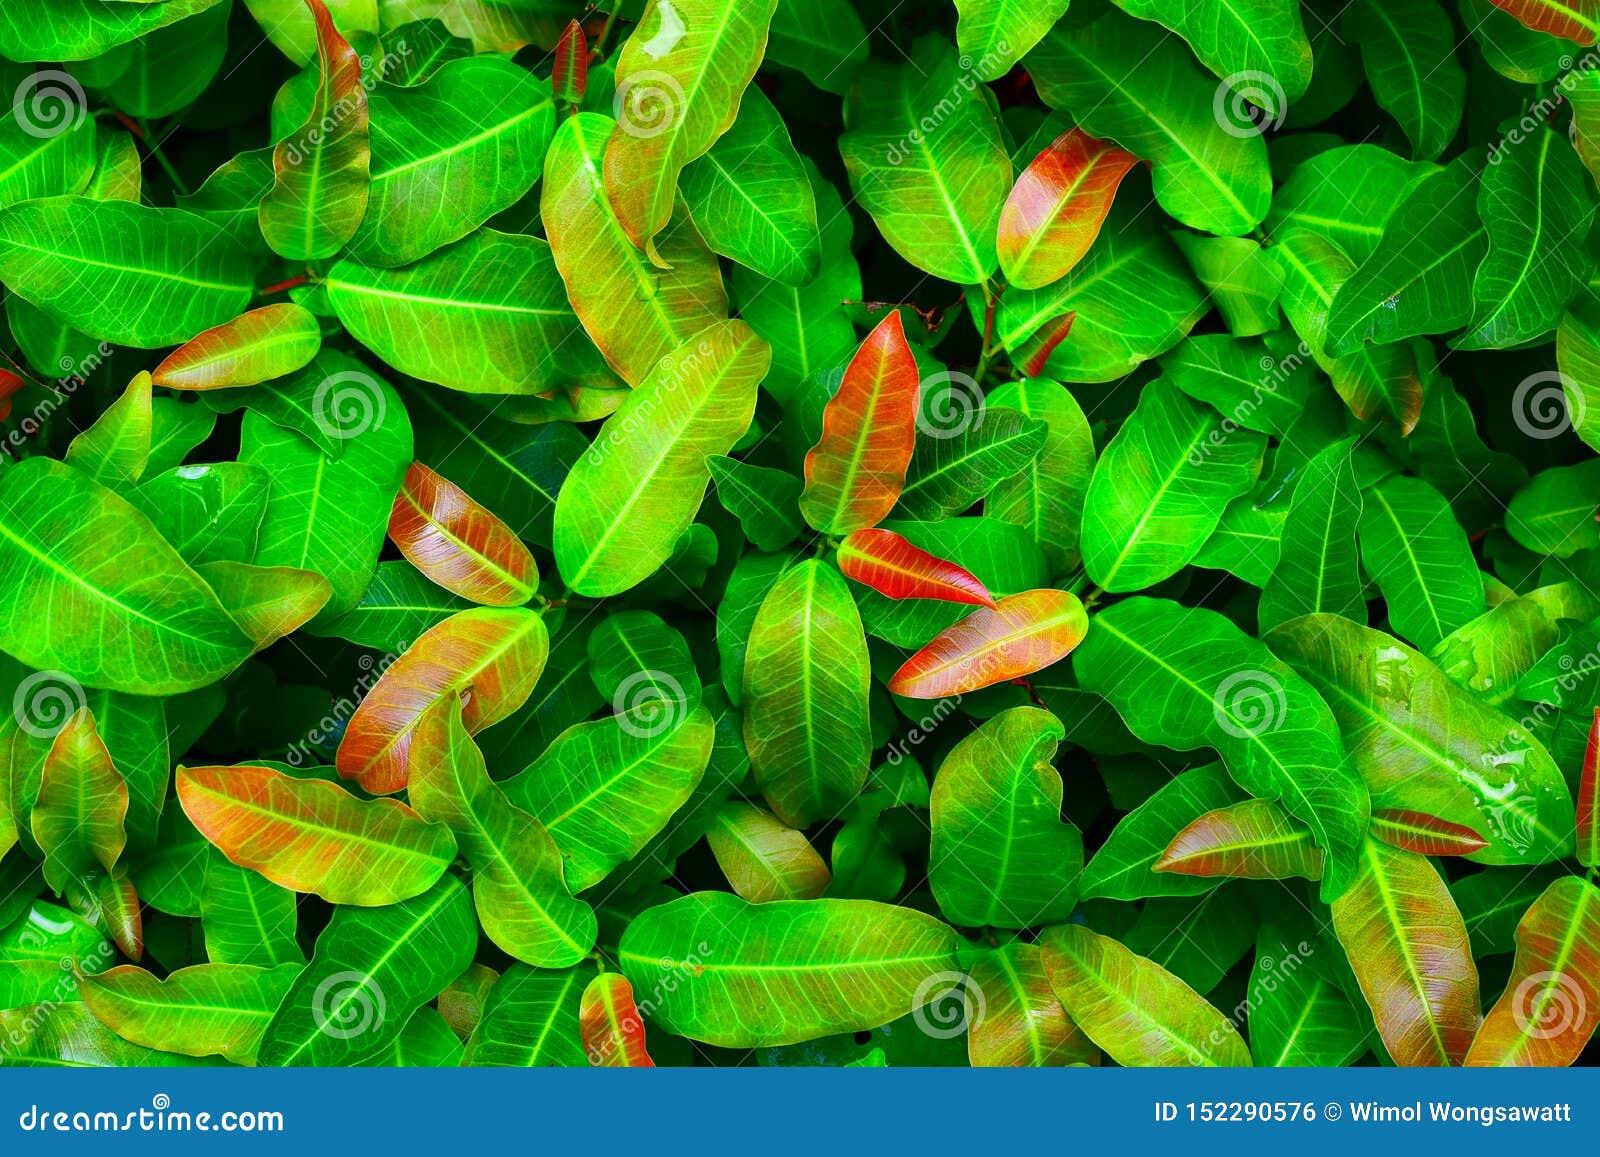 Full frame green leaf nature for background